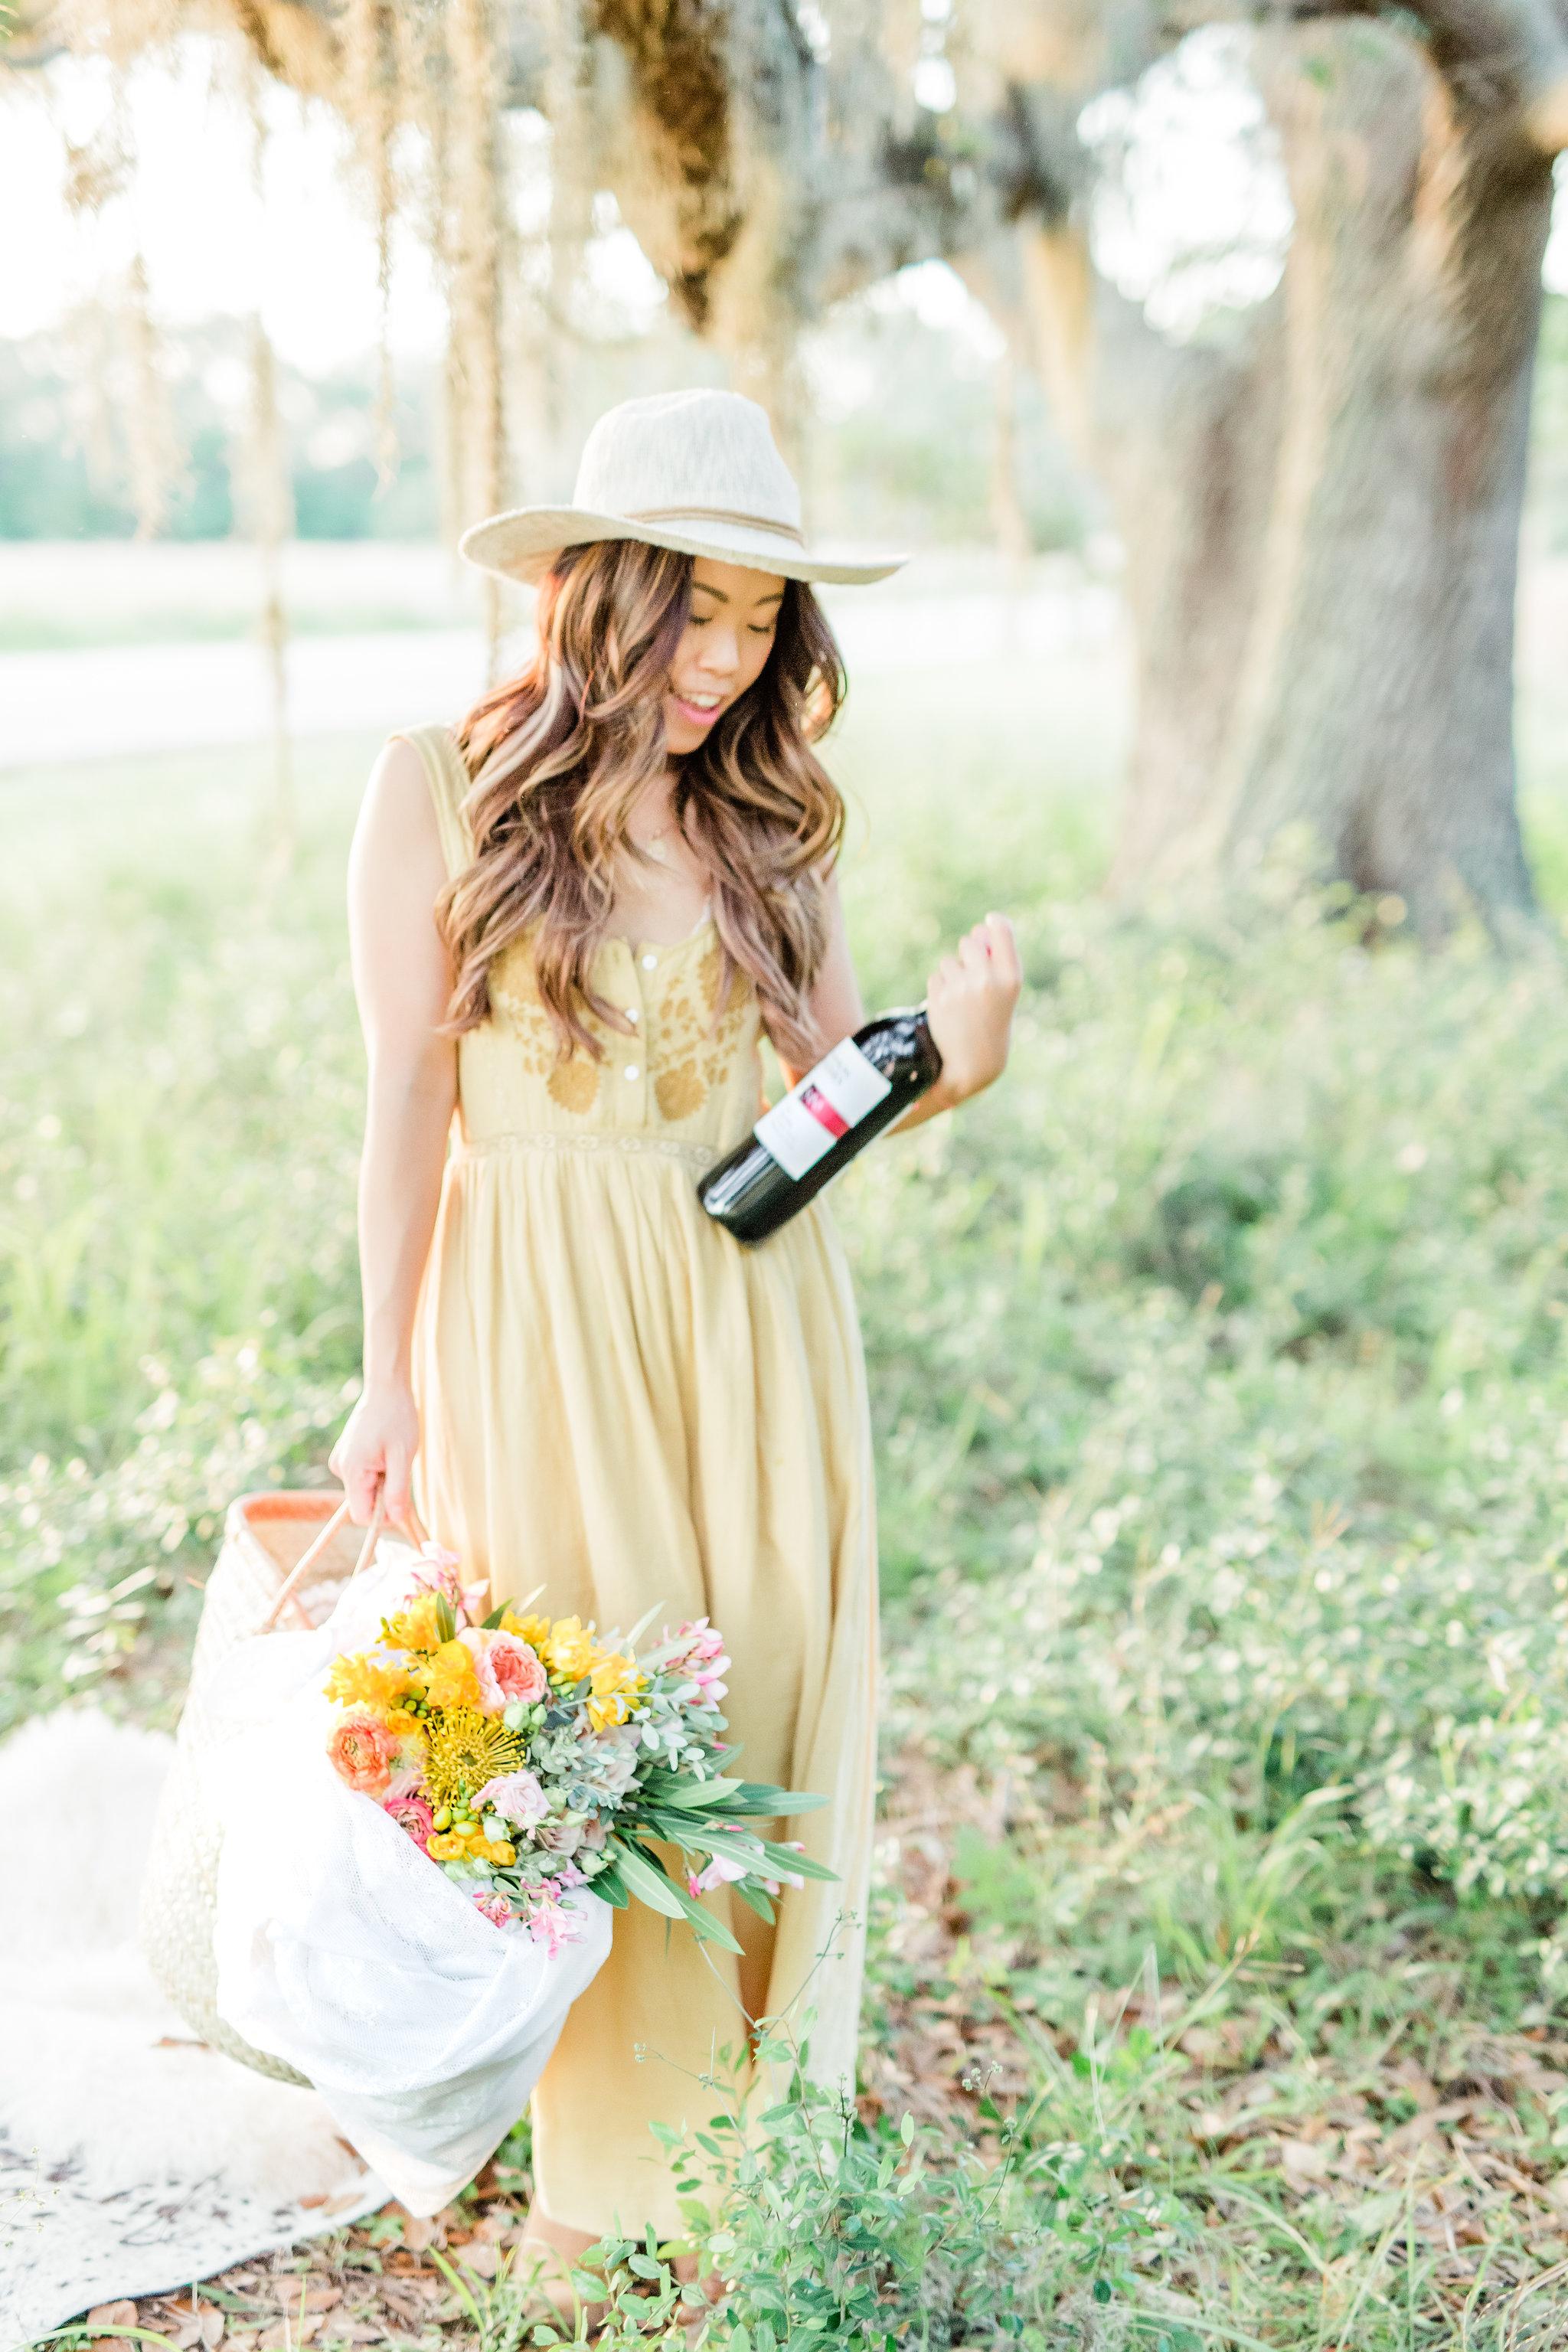 Cameron Hughes Wine Glamping Picnic Houston Picnic Spots Joyfullygreen